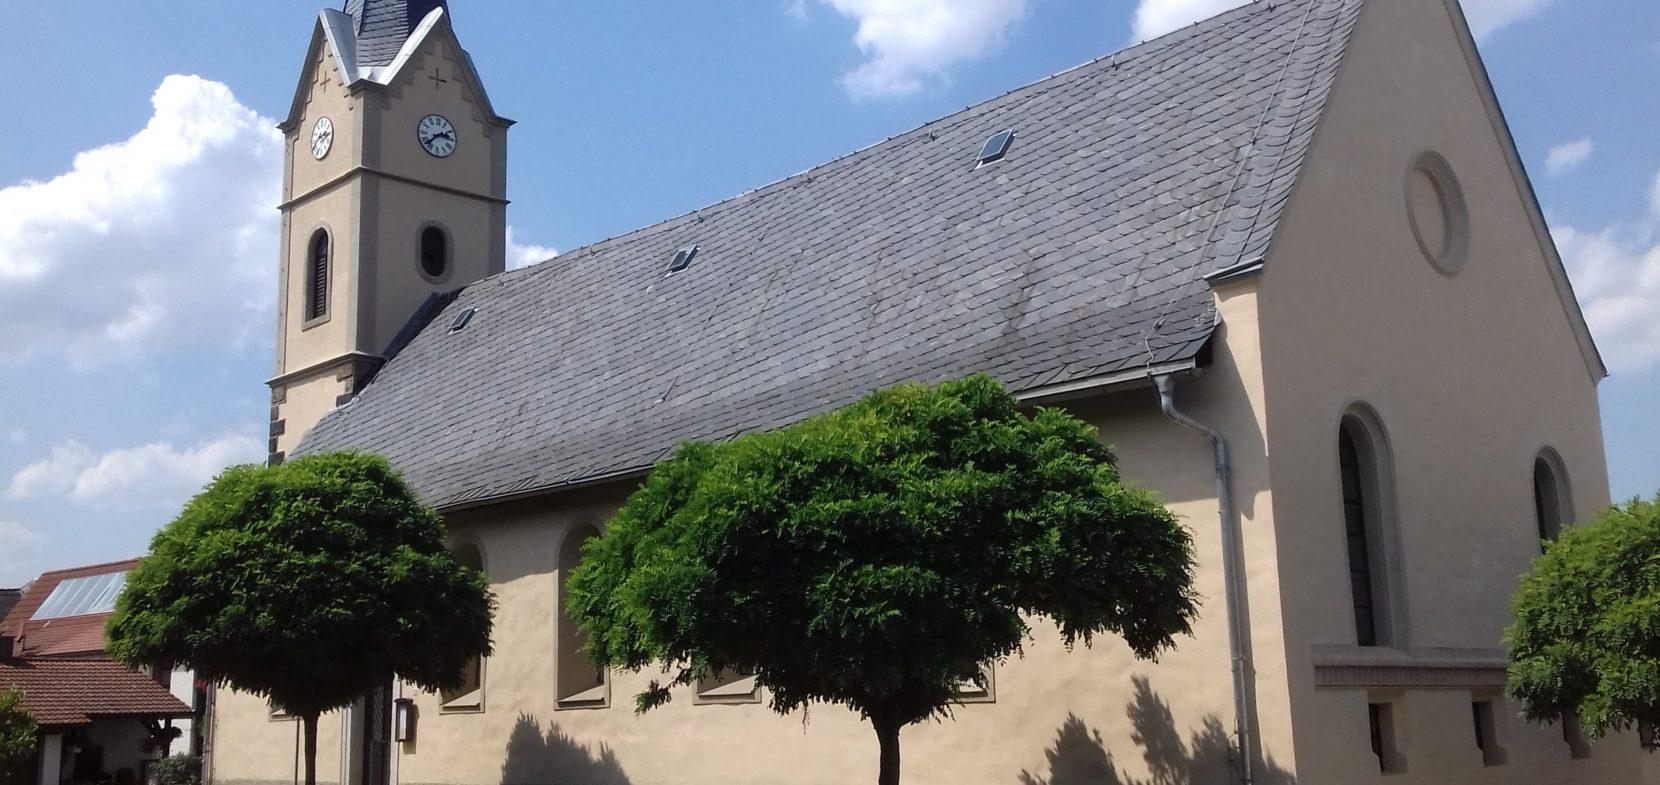 Ev.-Luth. Kirchgemeinde Ruppertsgrün